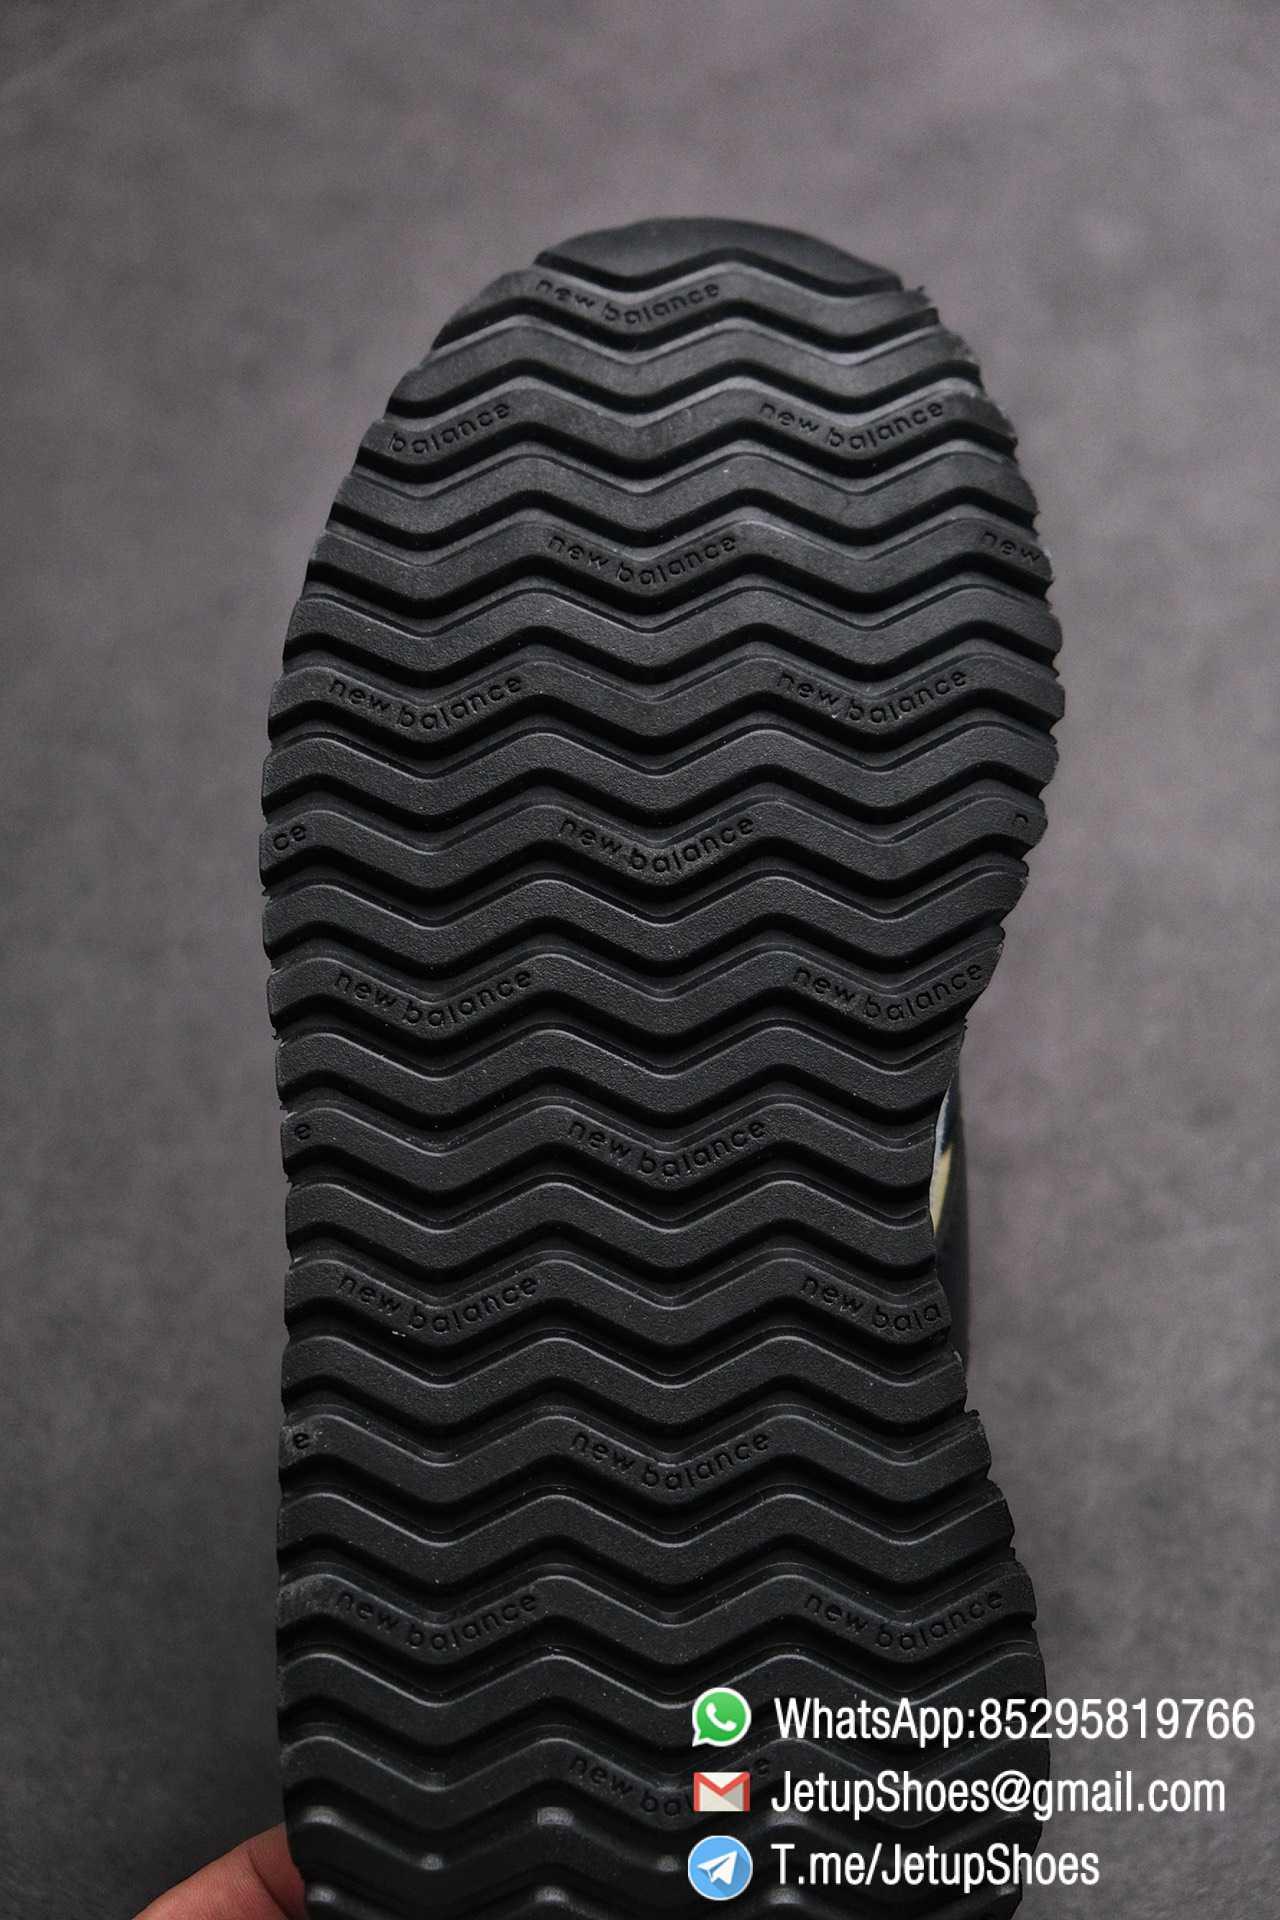 Best Replica 2021 New Balance 237 Yellow Purple Pink SKU MS237LB3 High Quality Running Shoes 09